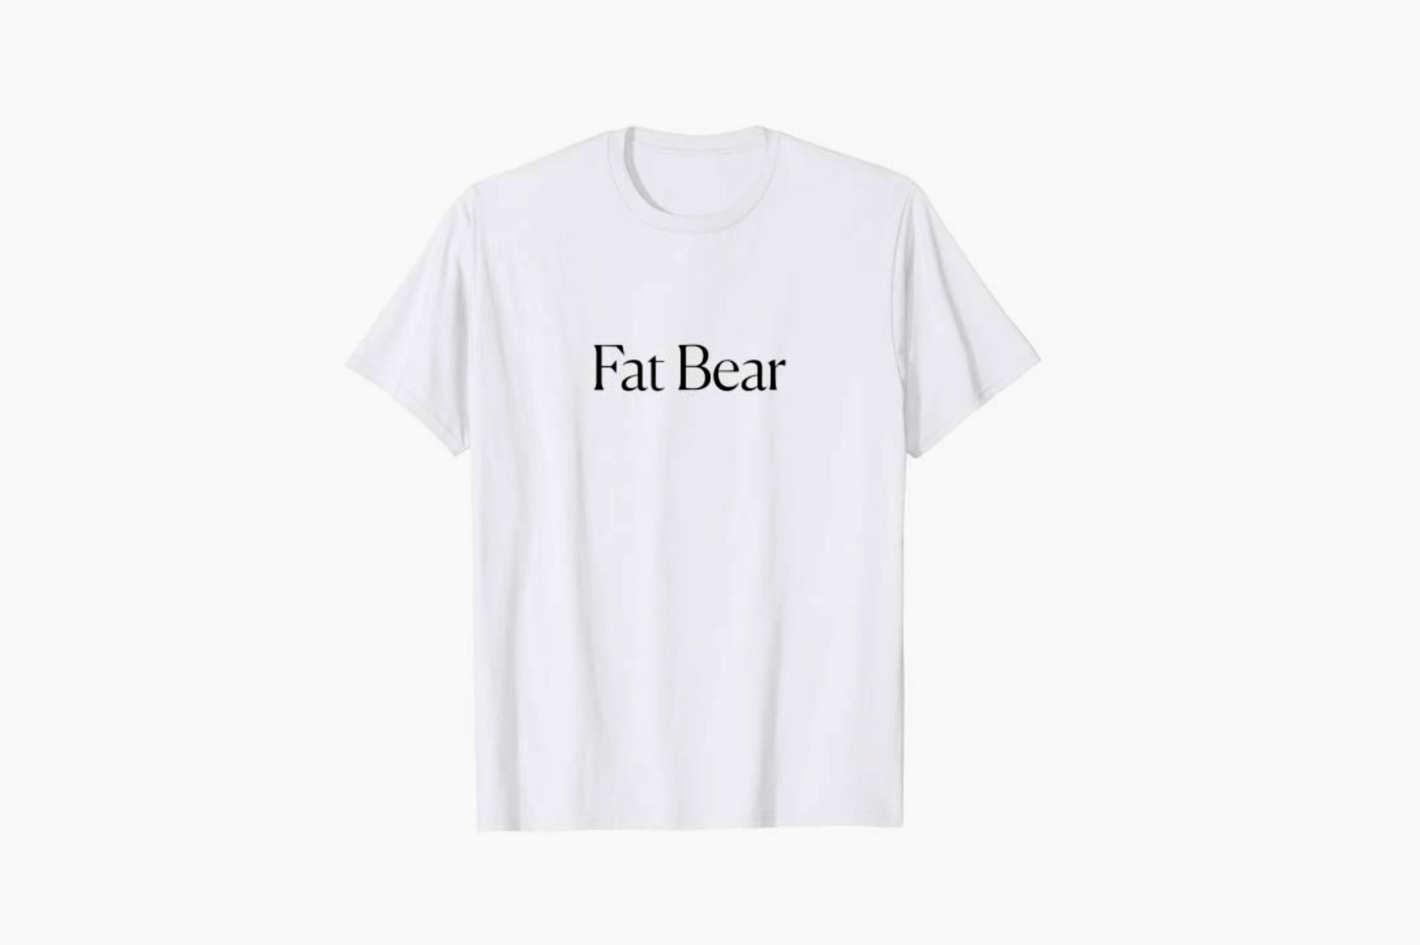 Fat Bear Tee